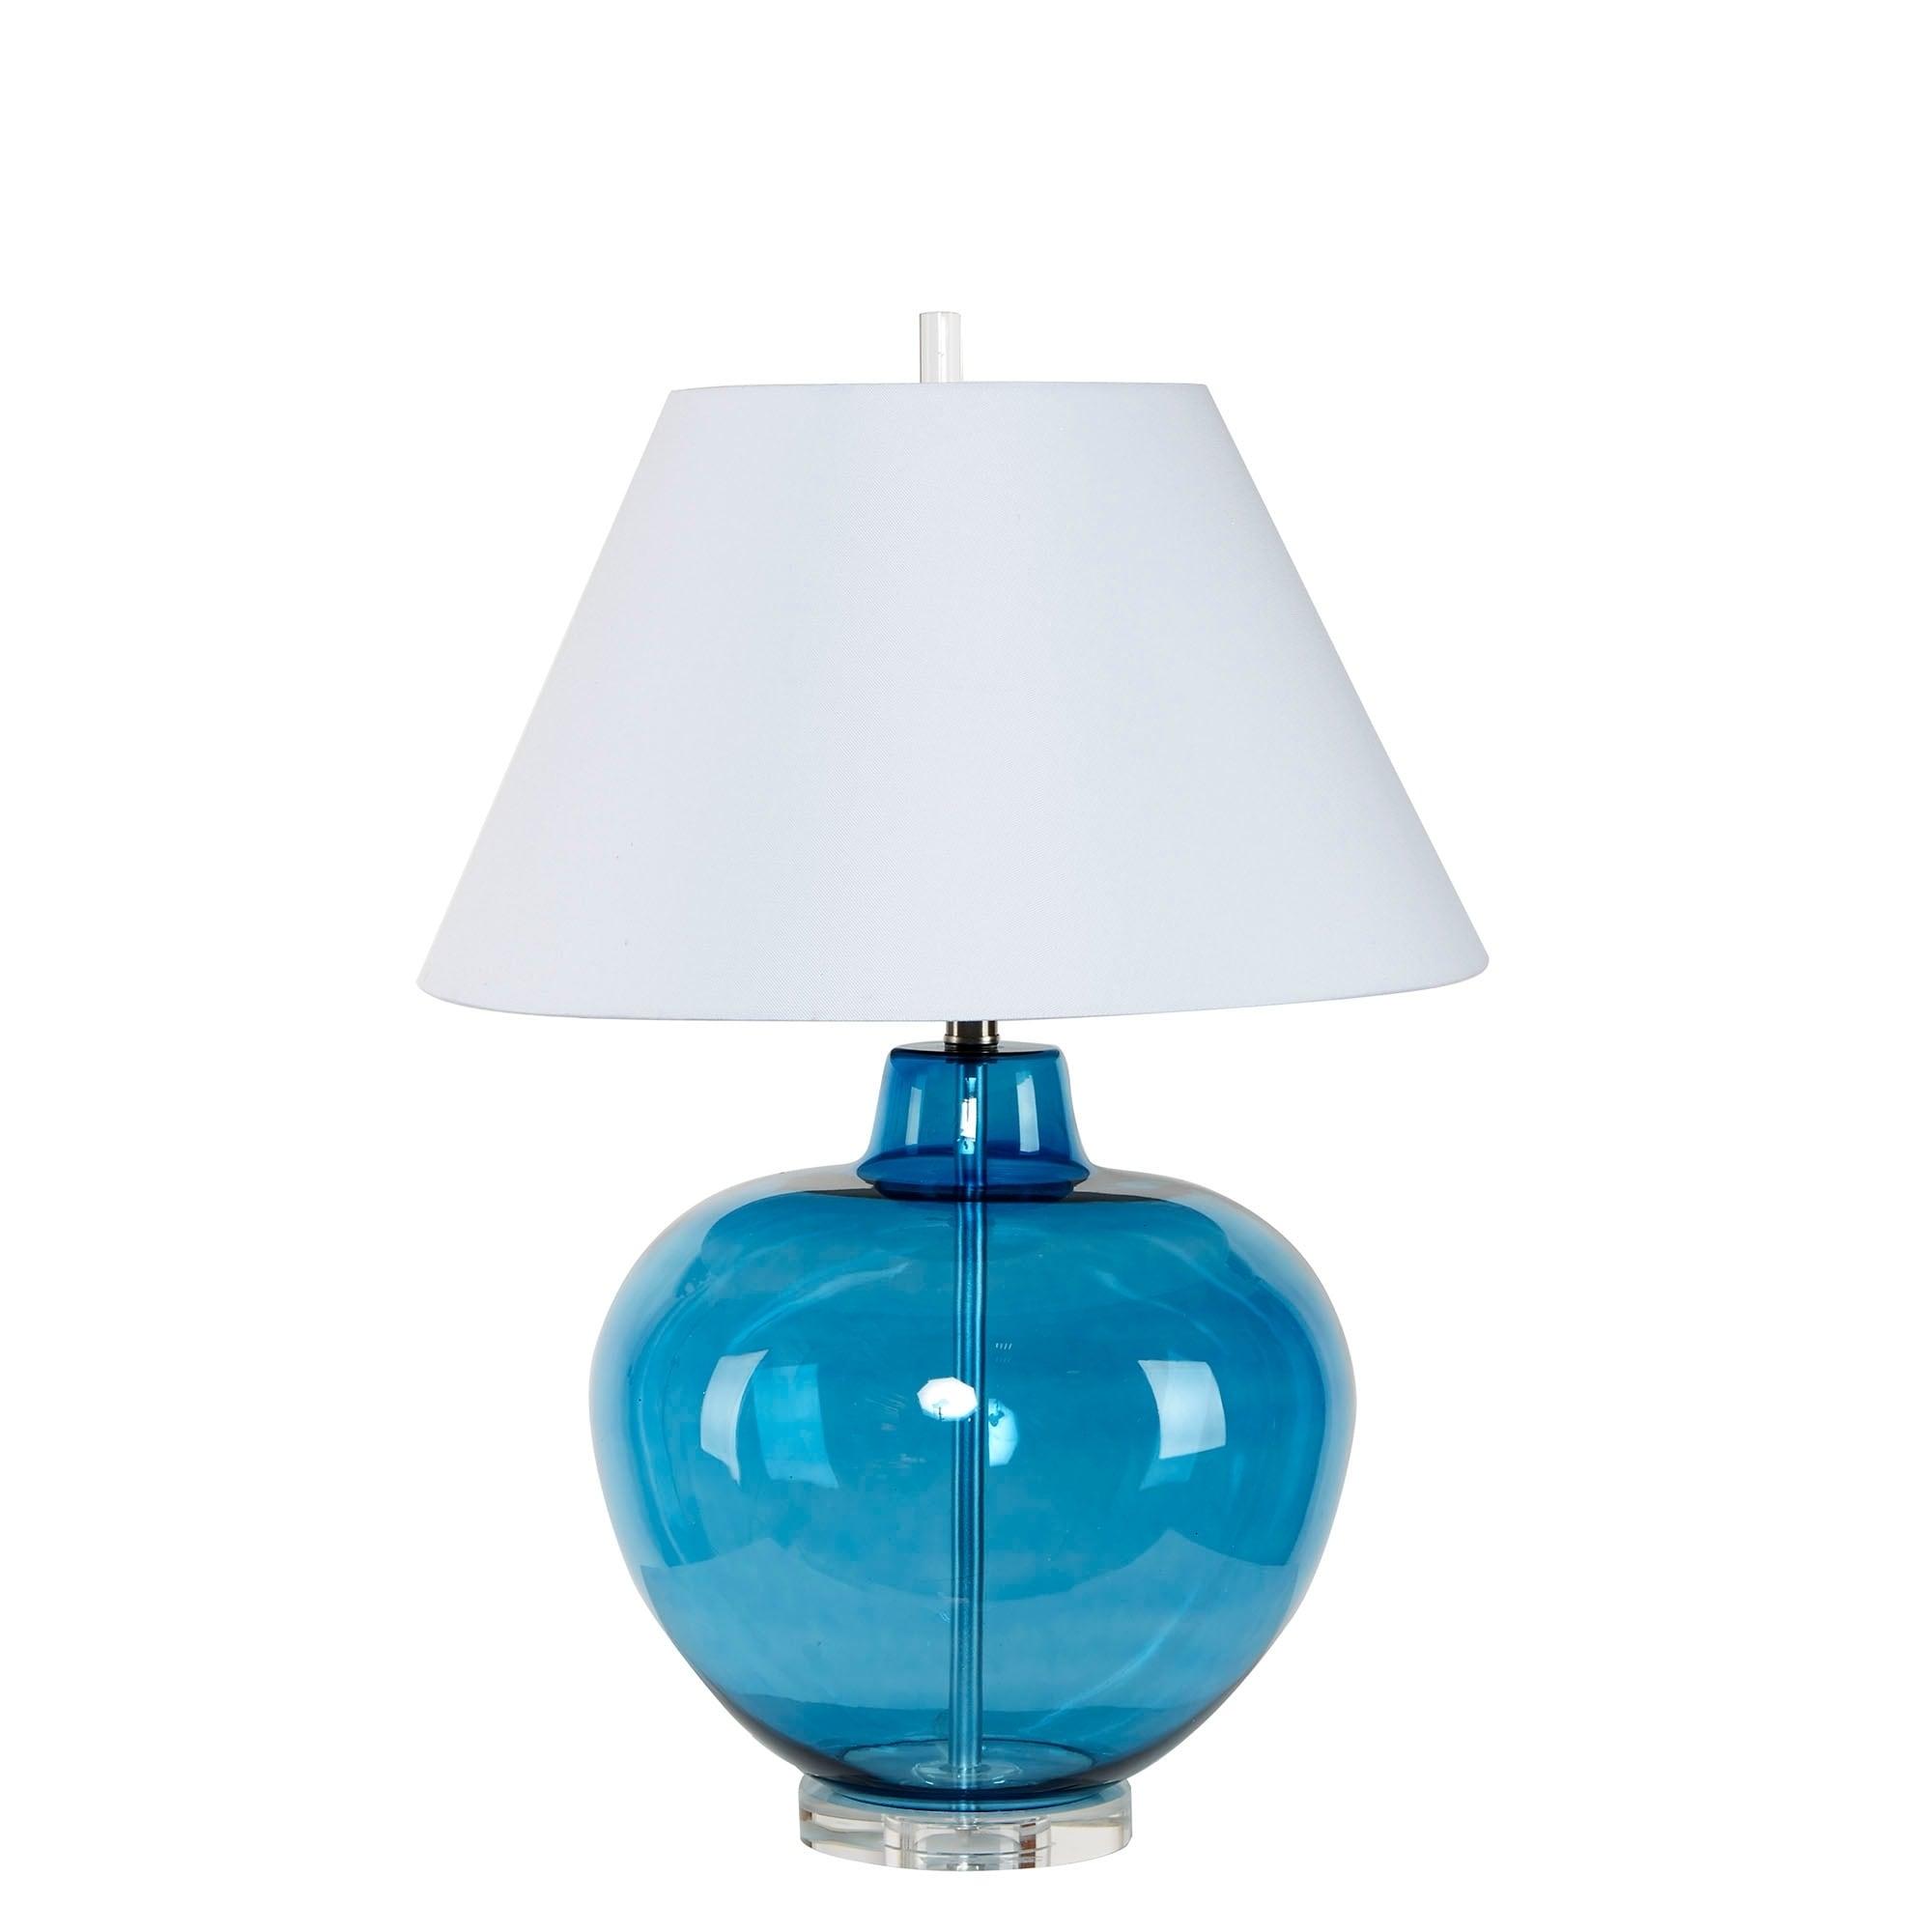 Dani Large Round Glass Table Lamp